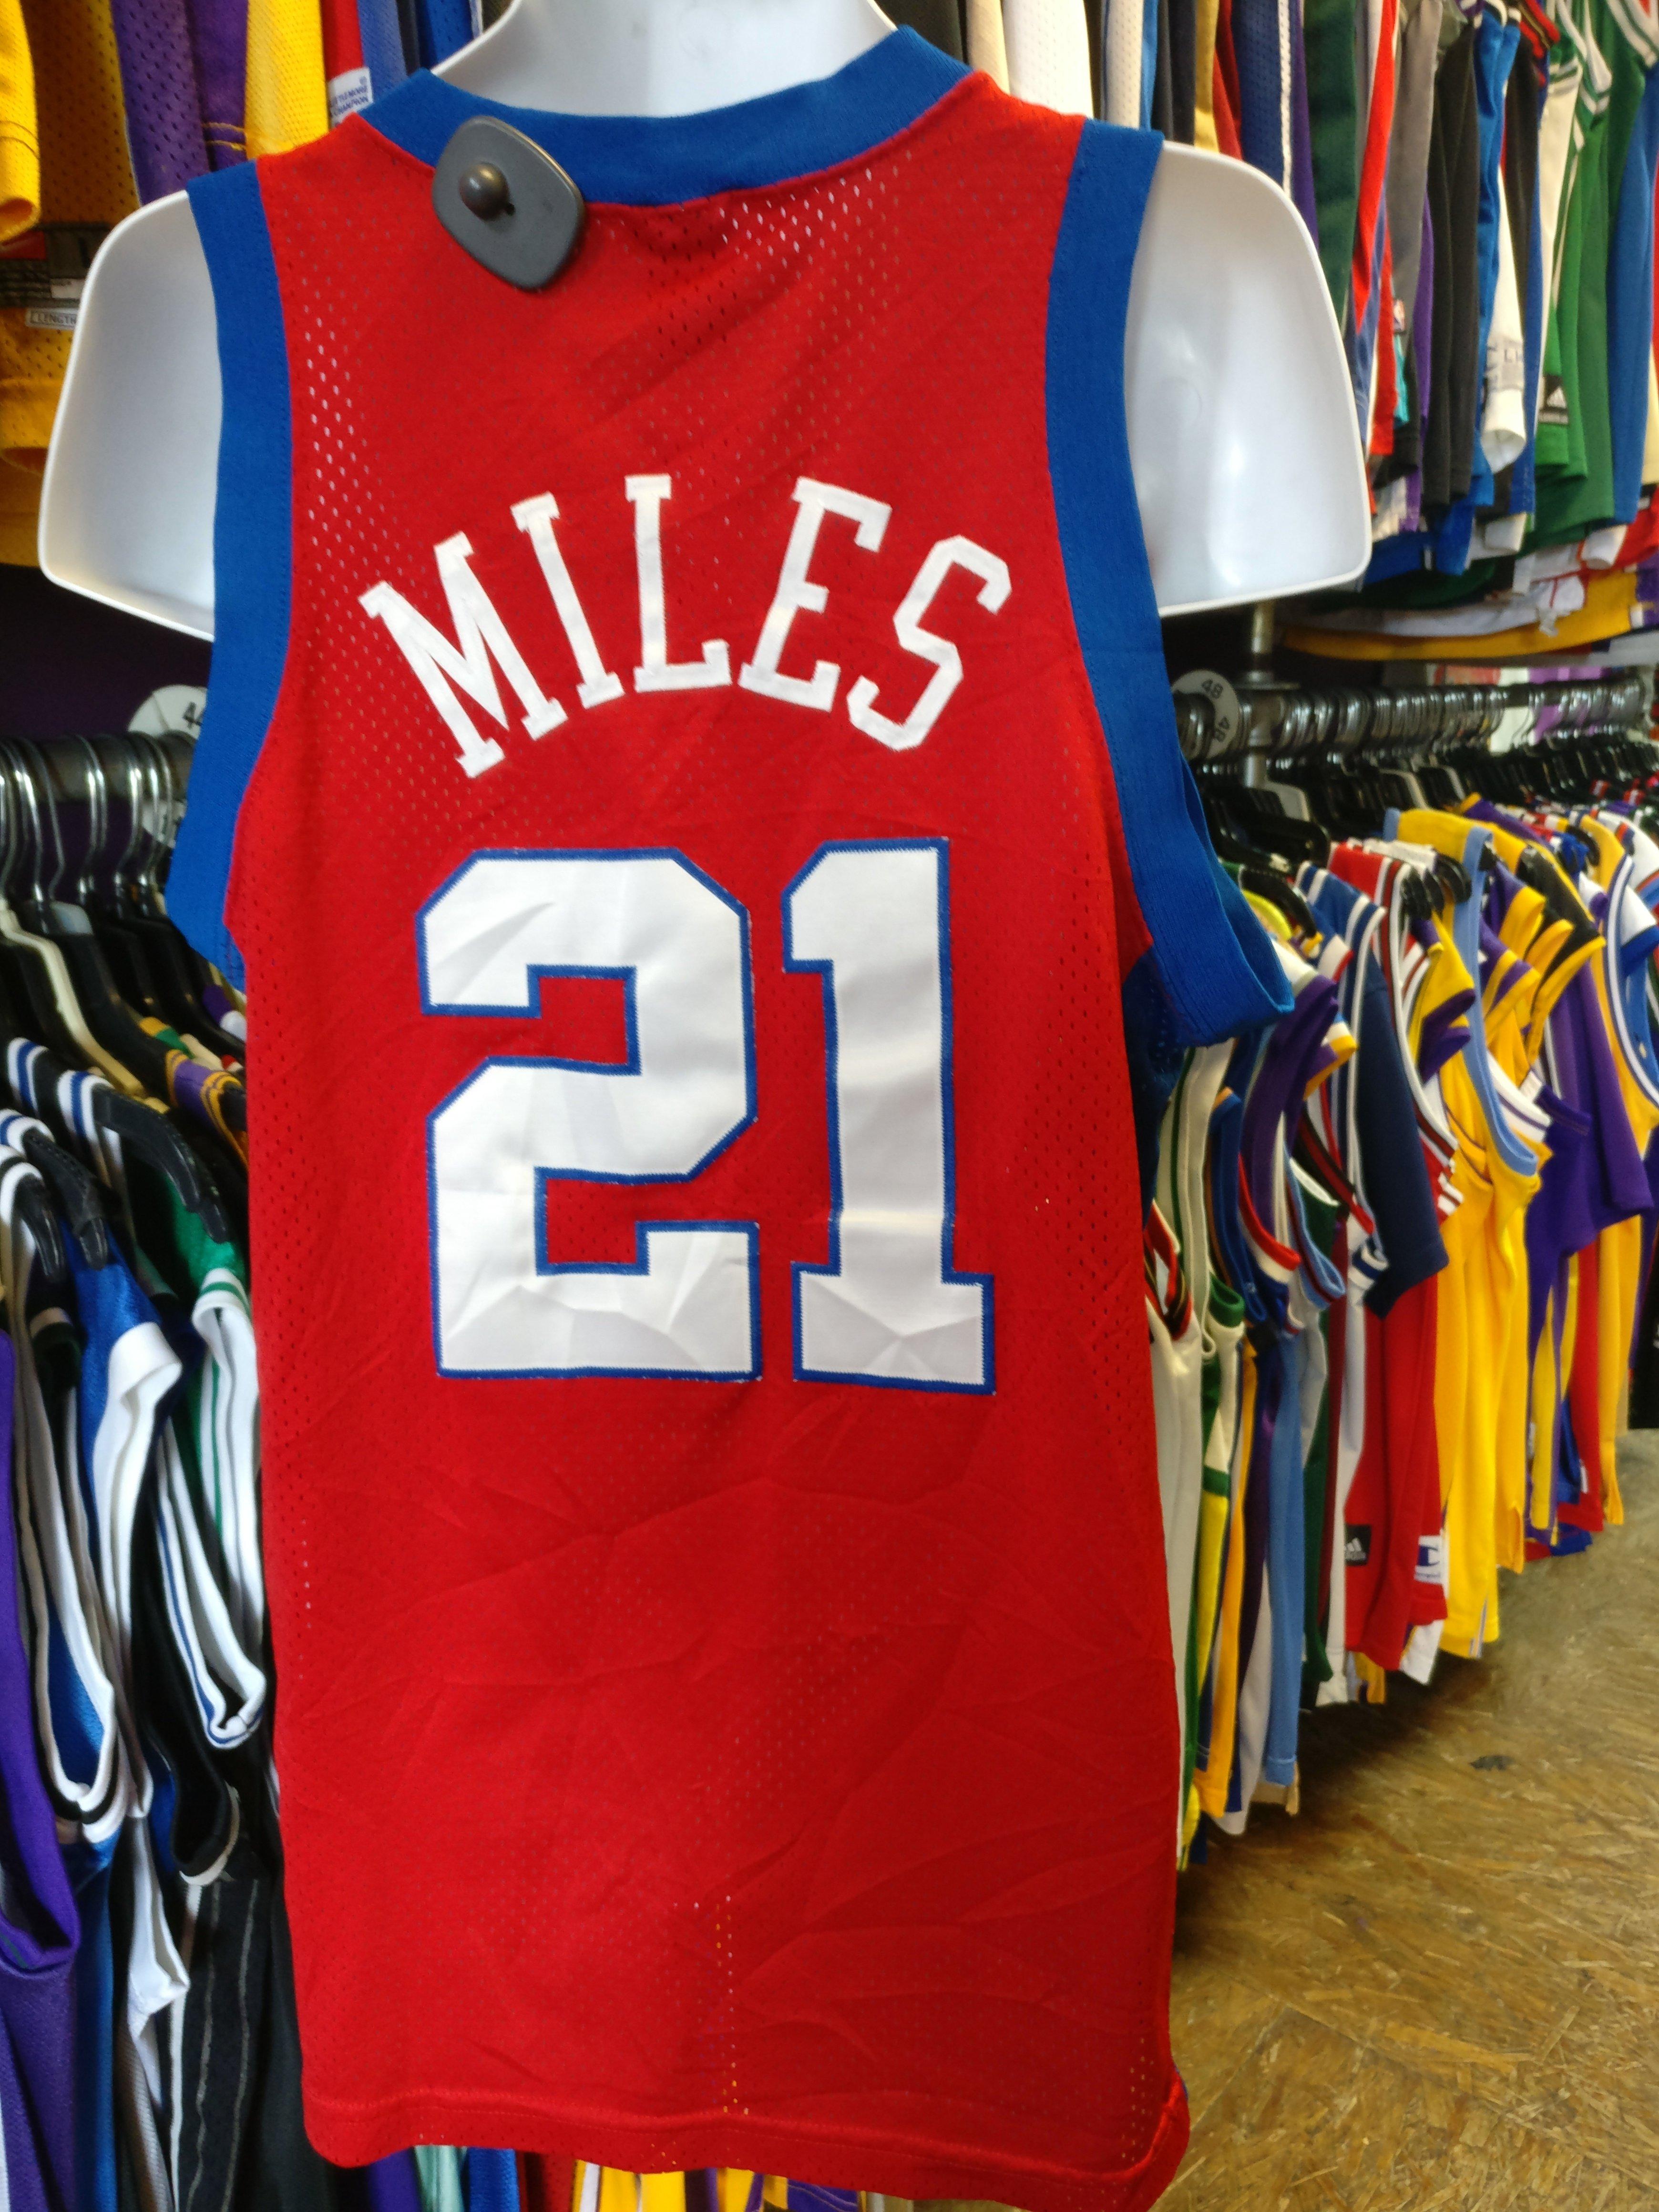 52fff9a5195 Vintage #21 DARIUS MILES Los Angeles Clippers NBA Nike Jersey M | shop @  XL3VintageClothing.net | Los Angeles Clippers, NBA, Nike